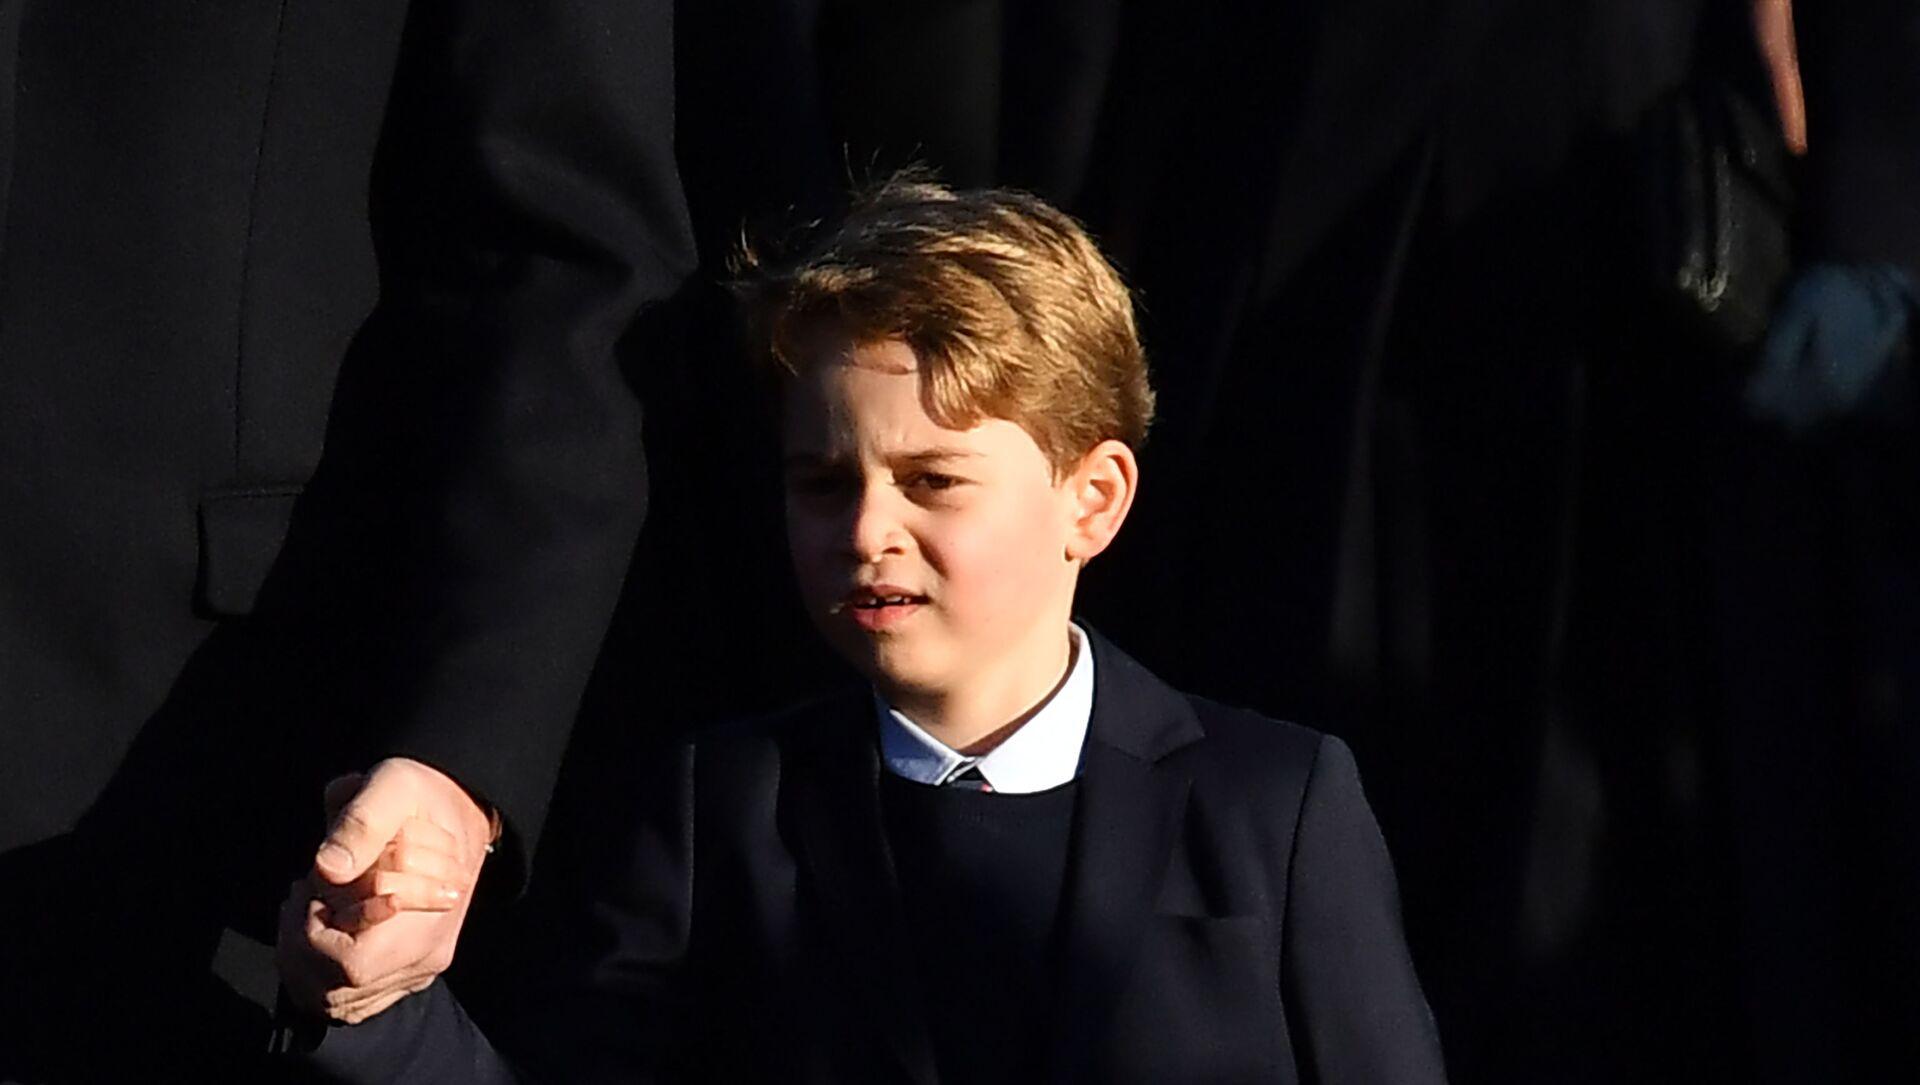 El príncipe George de Cambridge - Sputnik Mundo, 1920, 22.02.2020